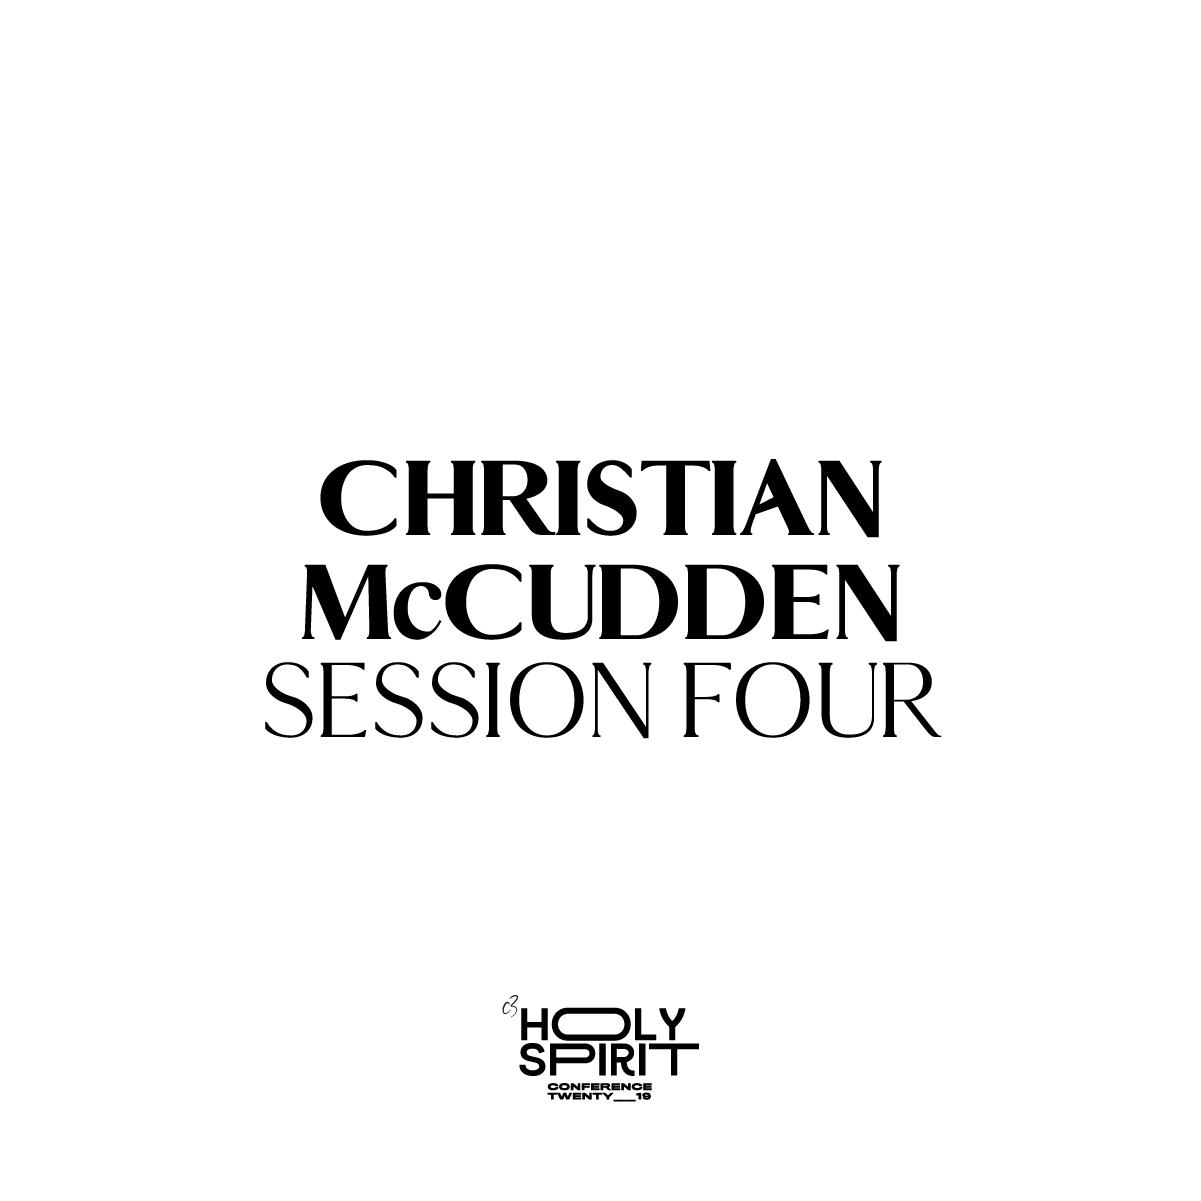 Session 4 - Christian McCudden